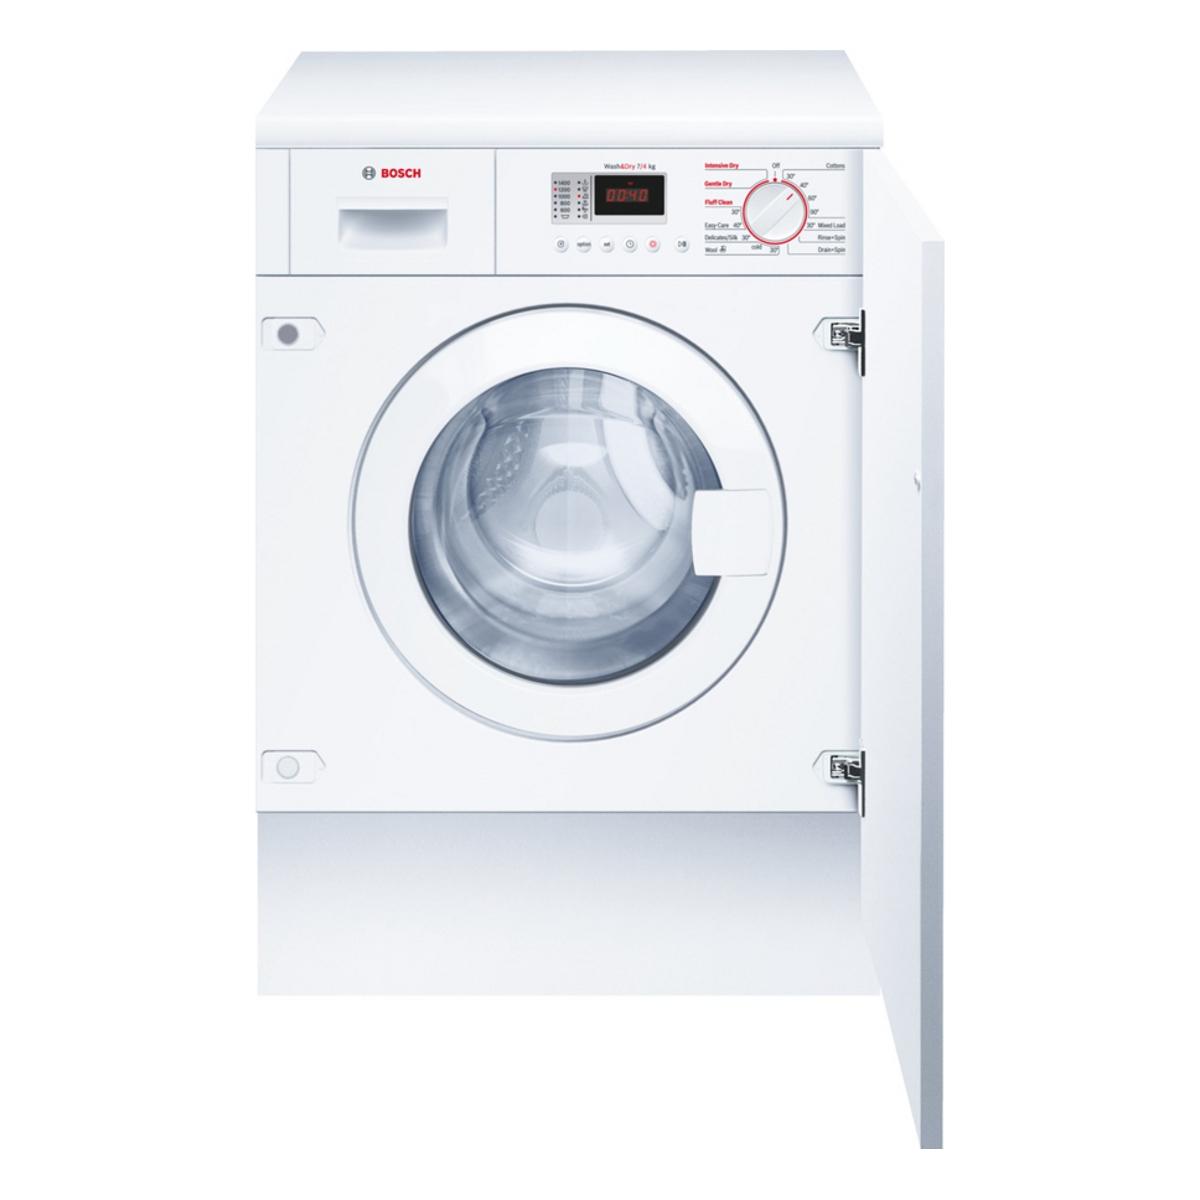 Bosch Wkd28351gb Integrated 7kg 1400rpm Washer Dryer Hughes